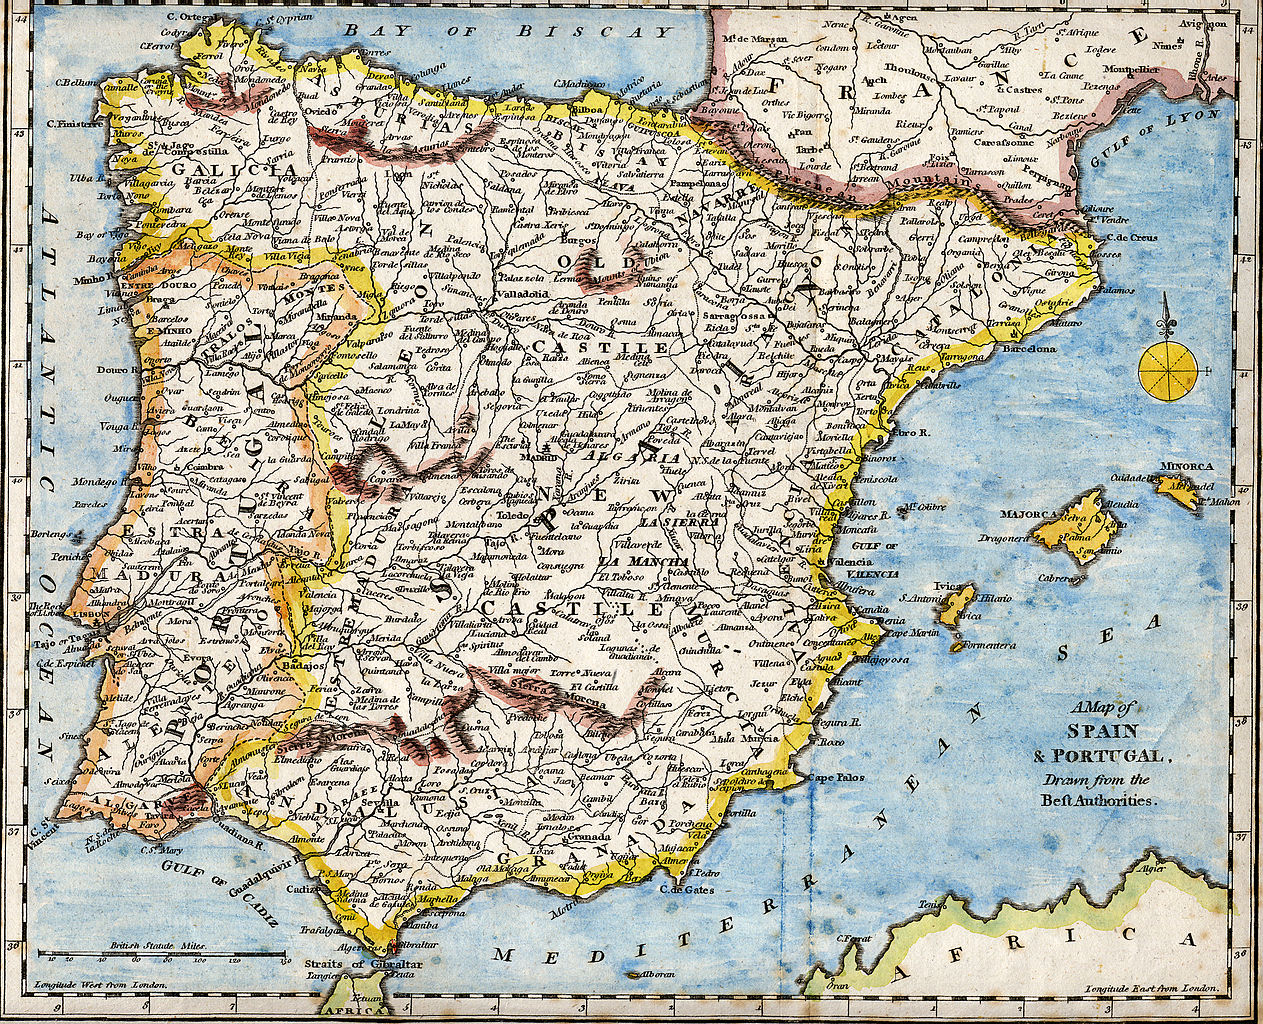 Map Of Spain Jpg.File Iberian Peninsula Antique Map Jpg Wikipedia